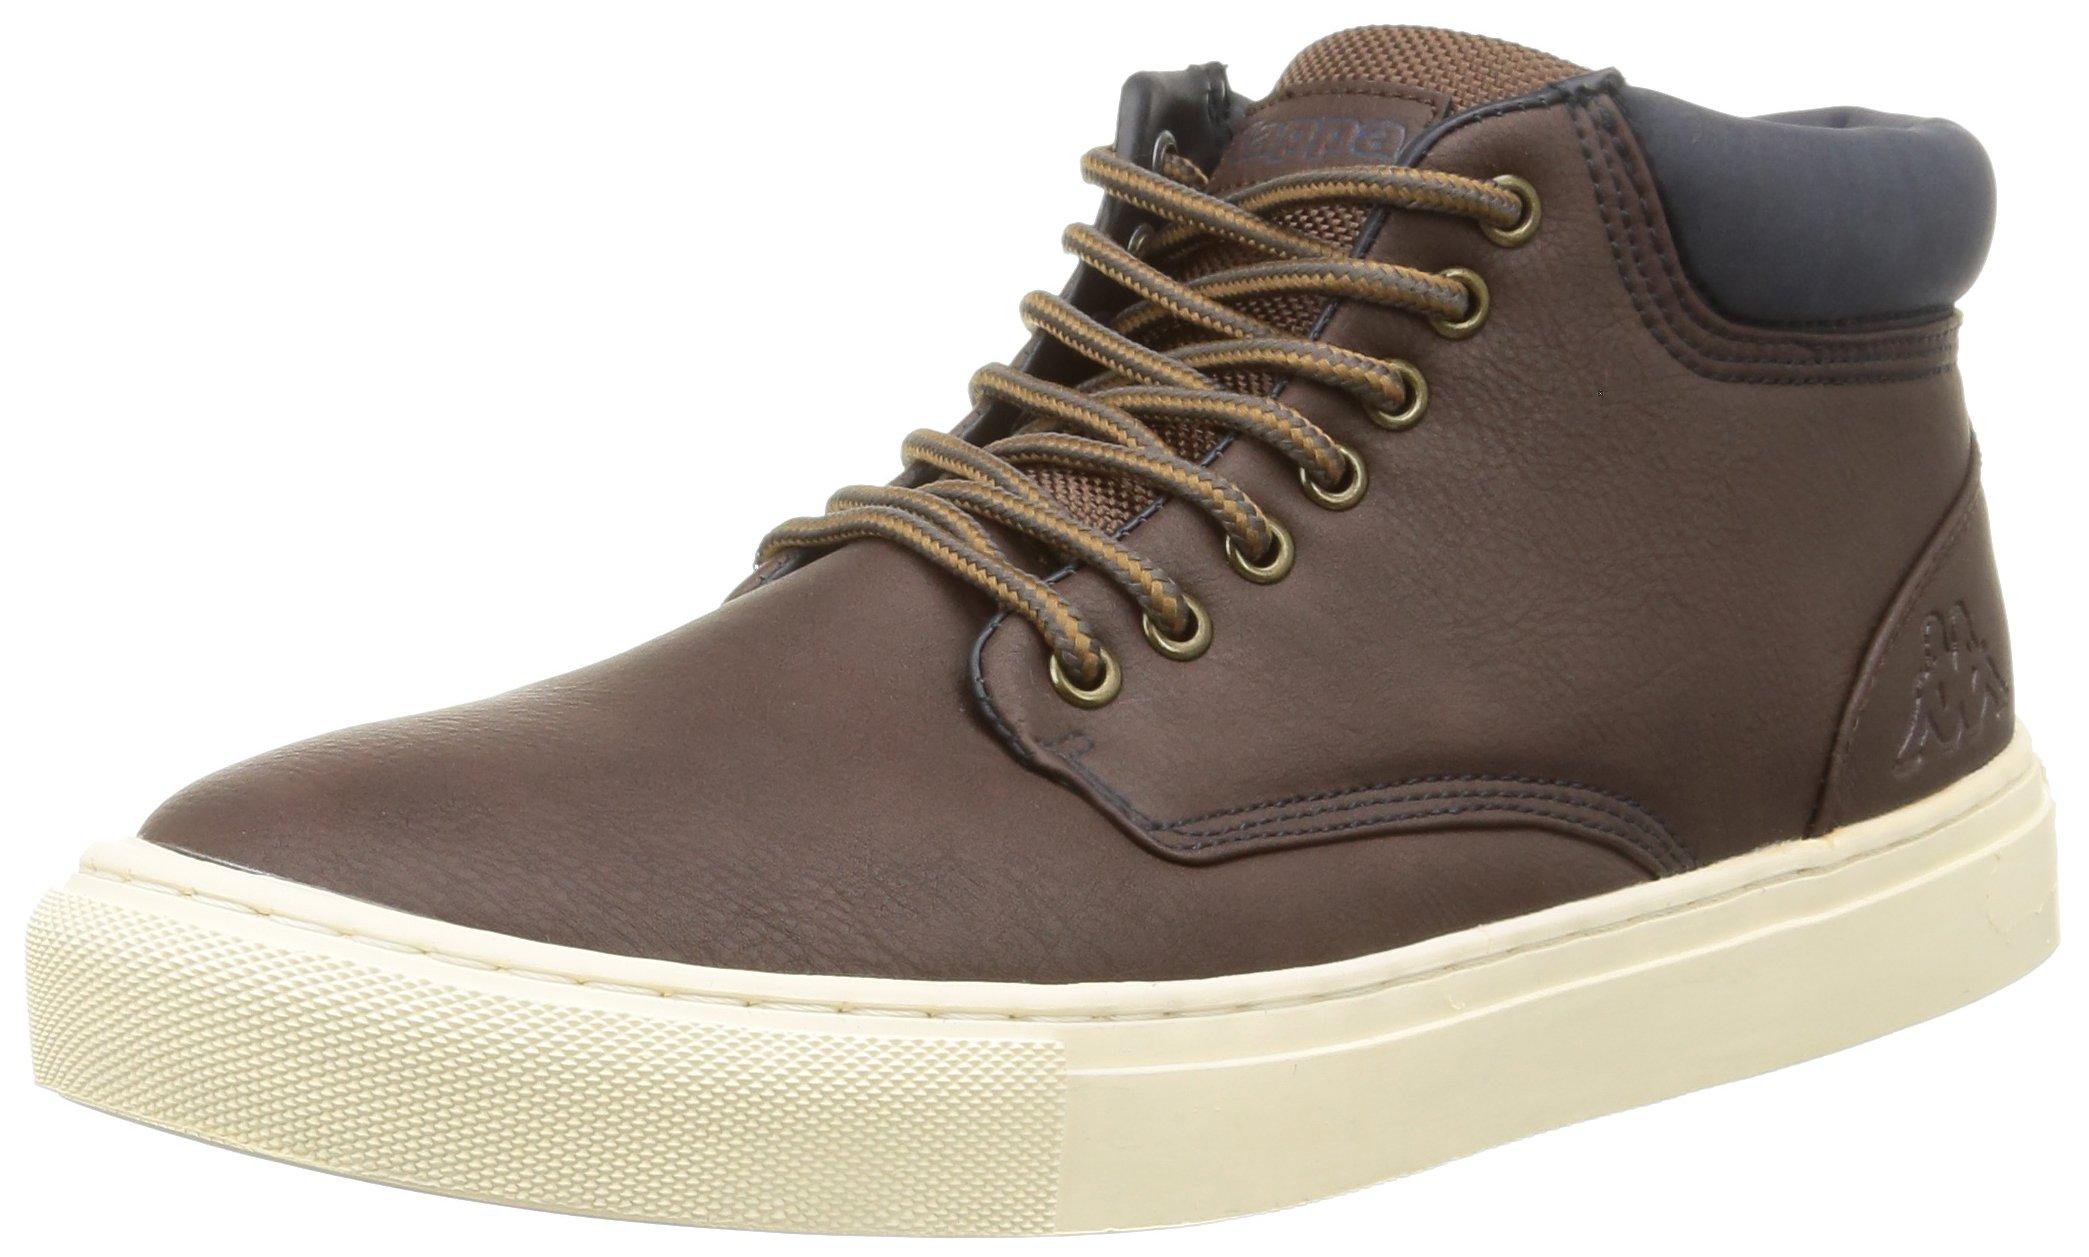 CoutemSneakers brown43 Eu Kappa Hautes HommeMarron932 0Pn8OwkX